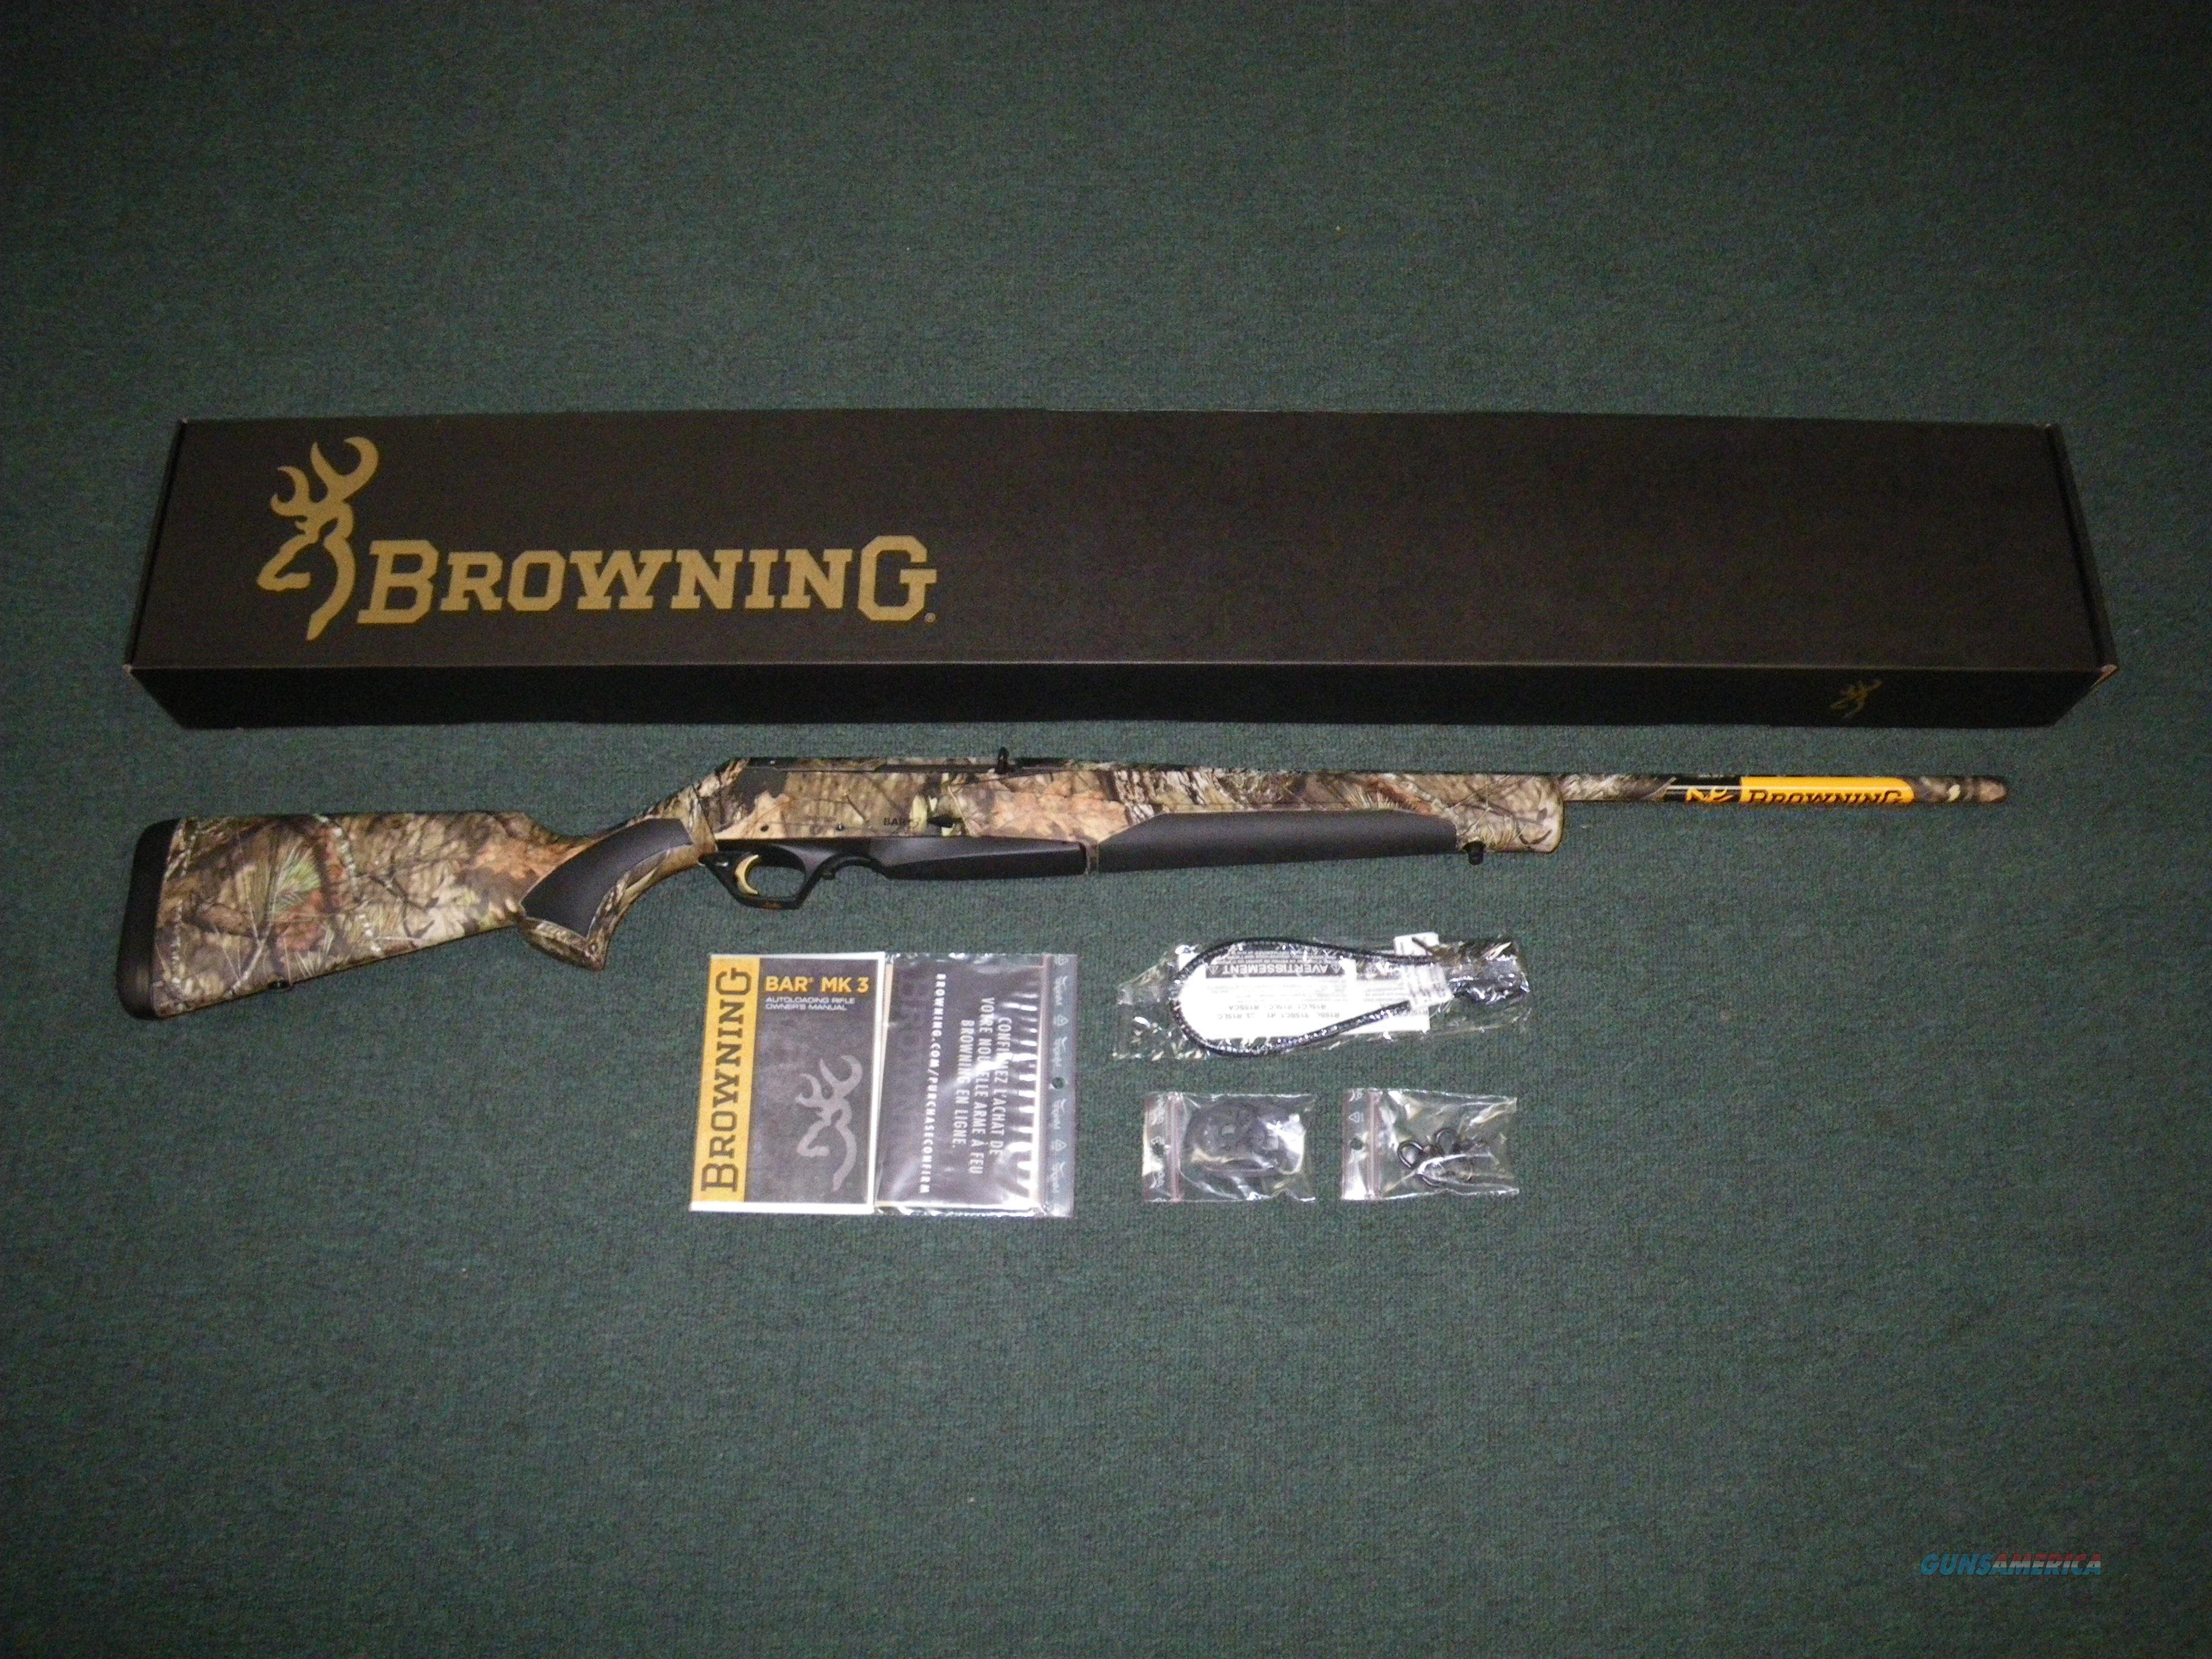 "Browning BAR MK3 MOBU Country 30-06 Spfld 22"" NEW 031049226  Guns > Rifles > Browning Rifles > Semi Auto > Hunting"